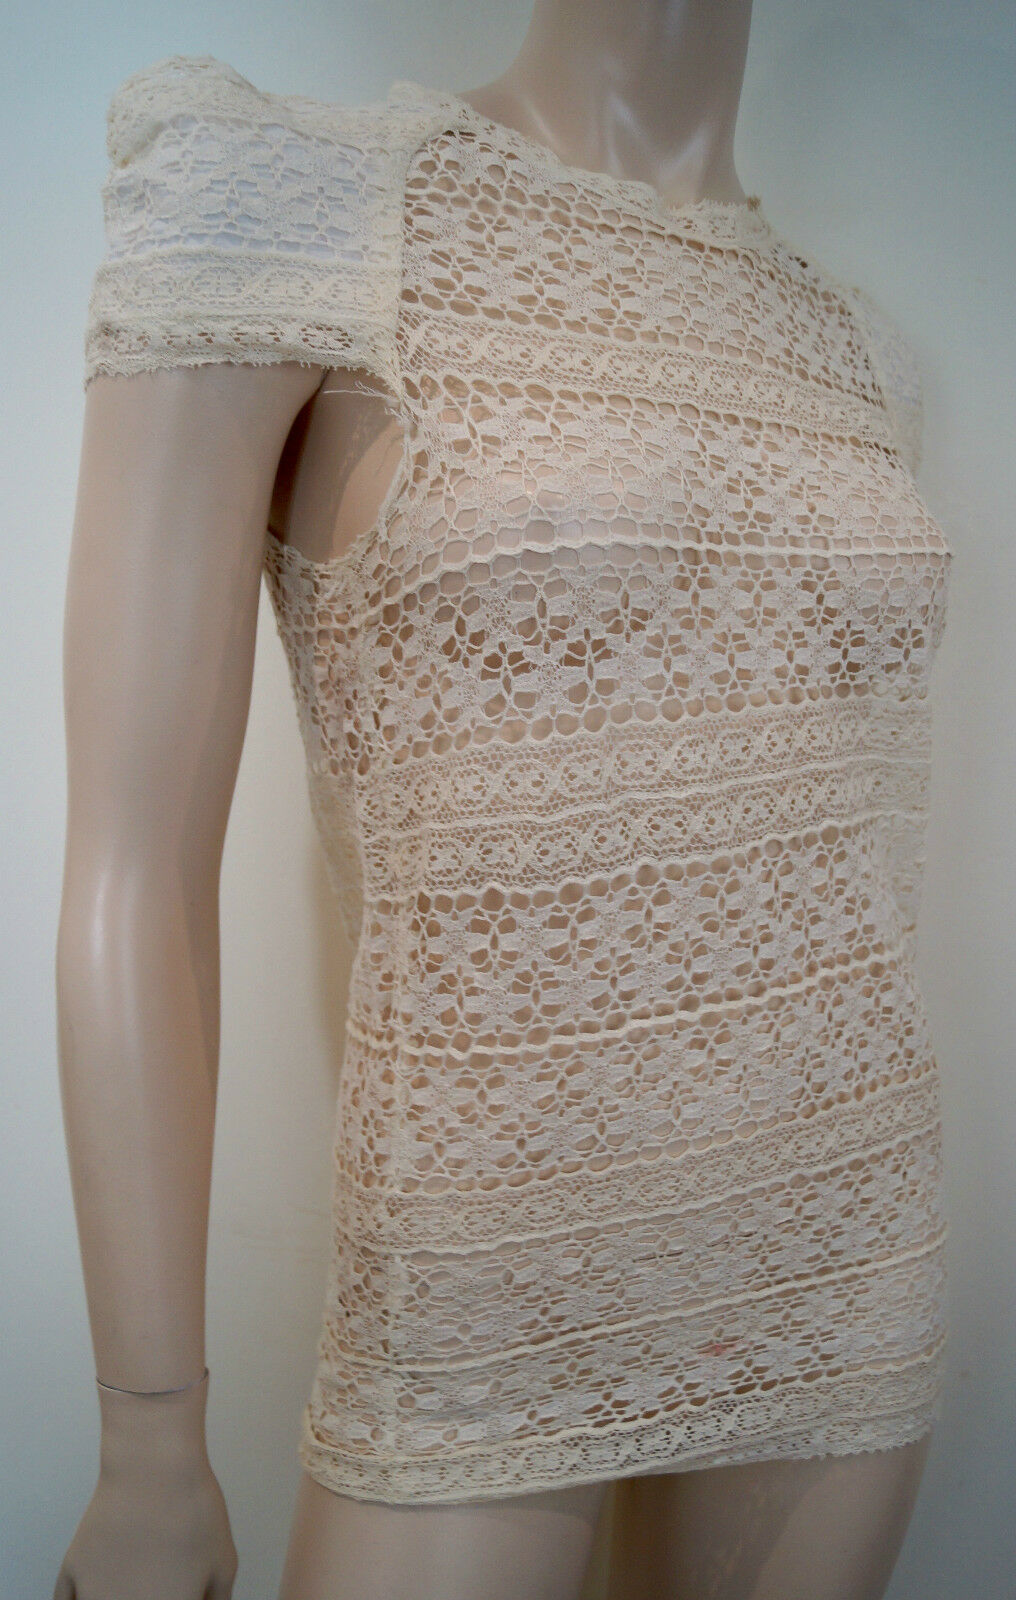 ISABEL MARANT Cream Cotton Blend Crochet Lace Pleated Short Sleeve Top Sz 0; S